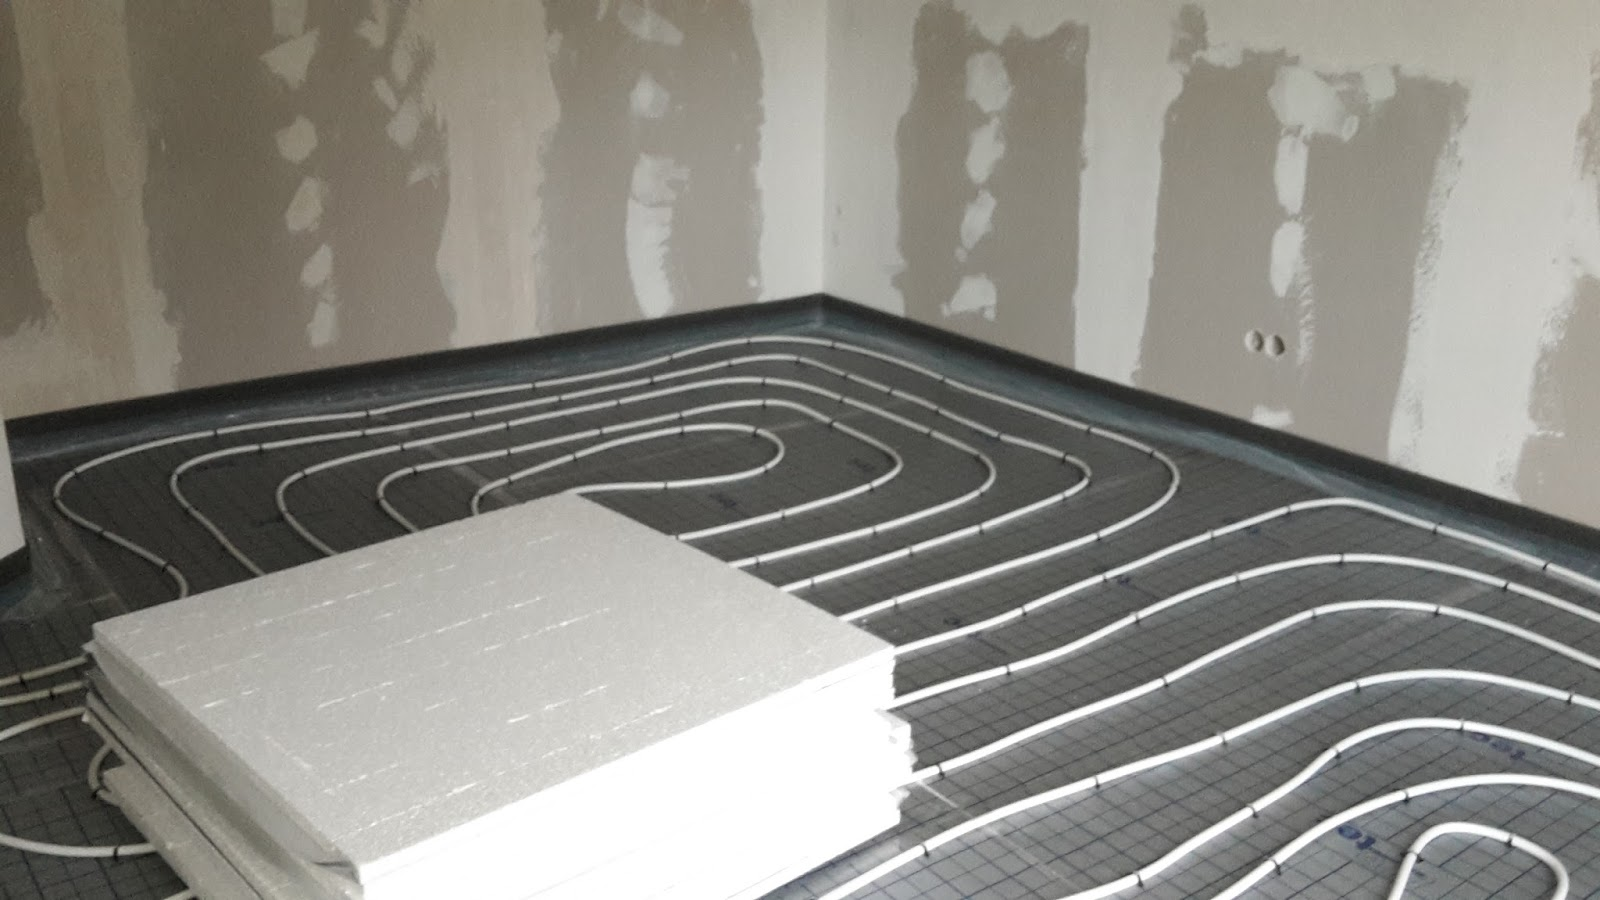 abenteuer ausbauhaus fu bodenheizung dg. Black Bedroom Furniture Sets. Home Design Ideas